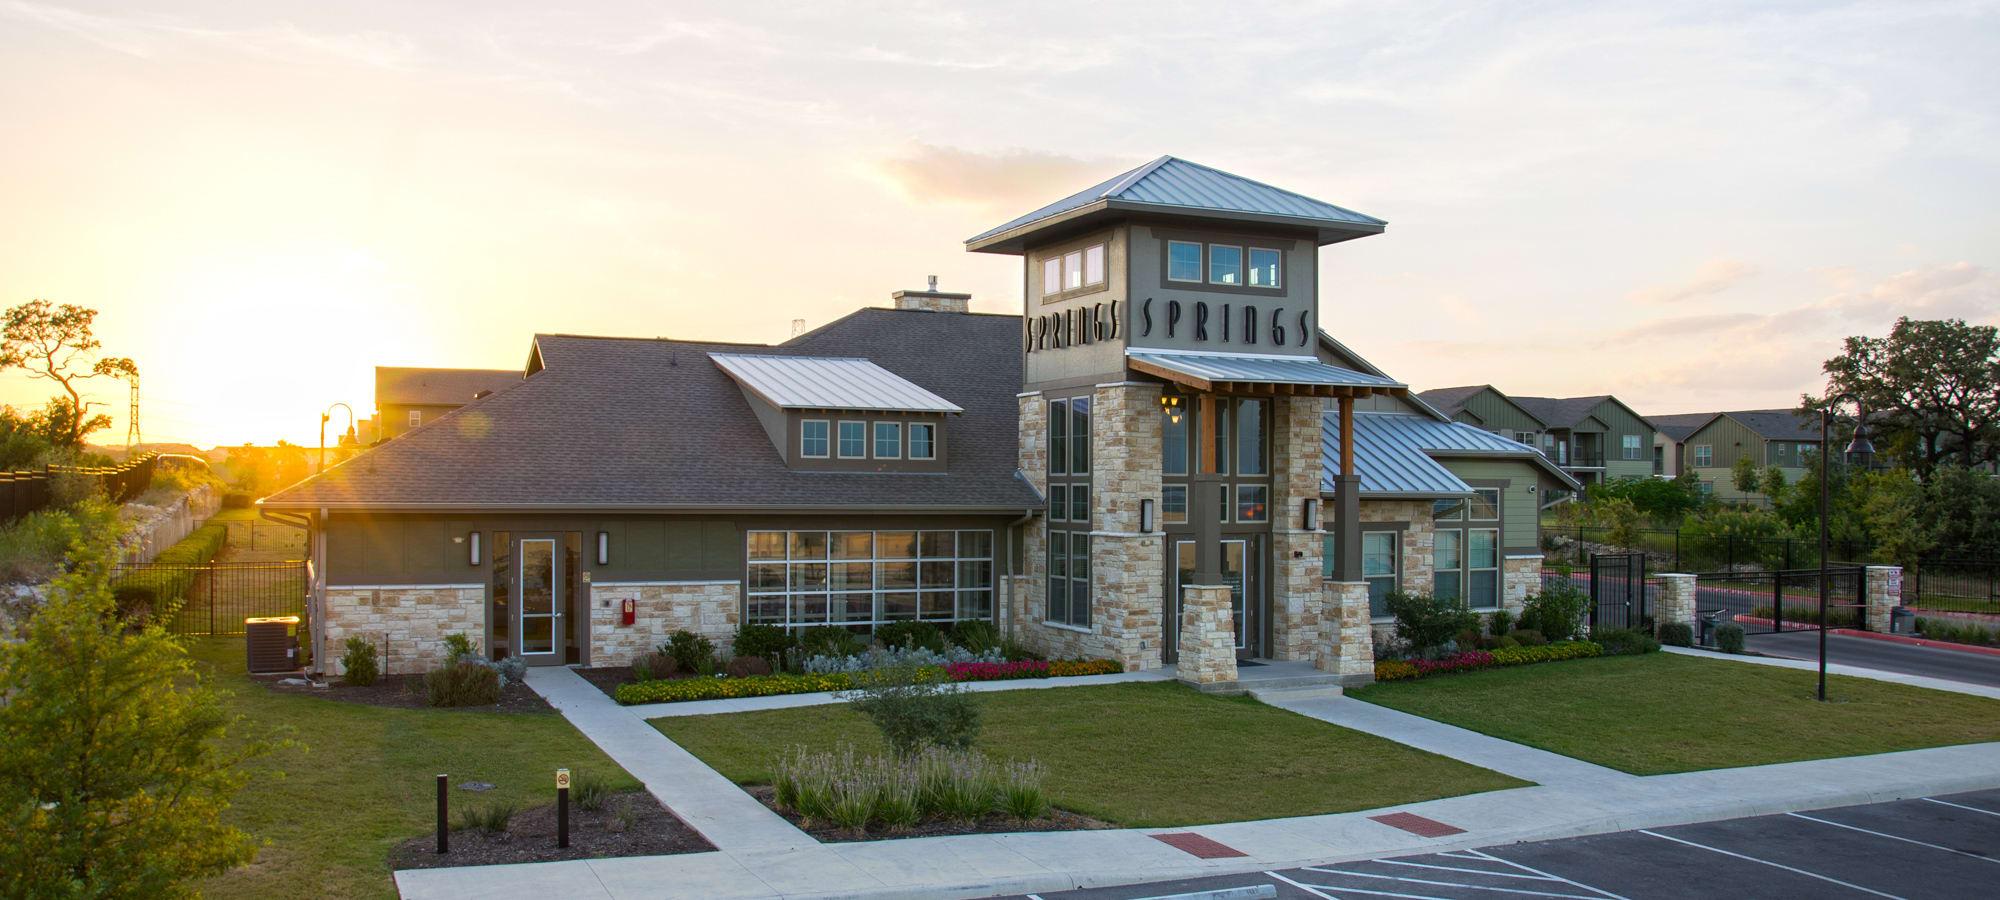 Apartments in New Braunfels, TX